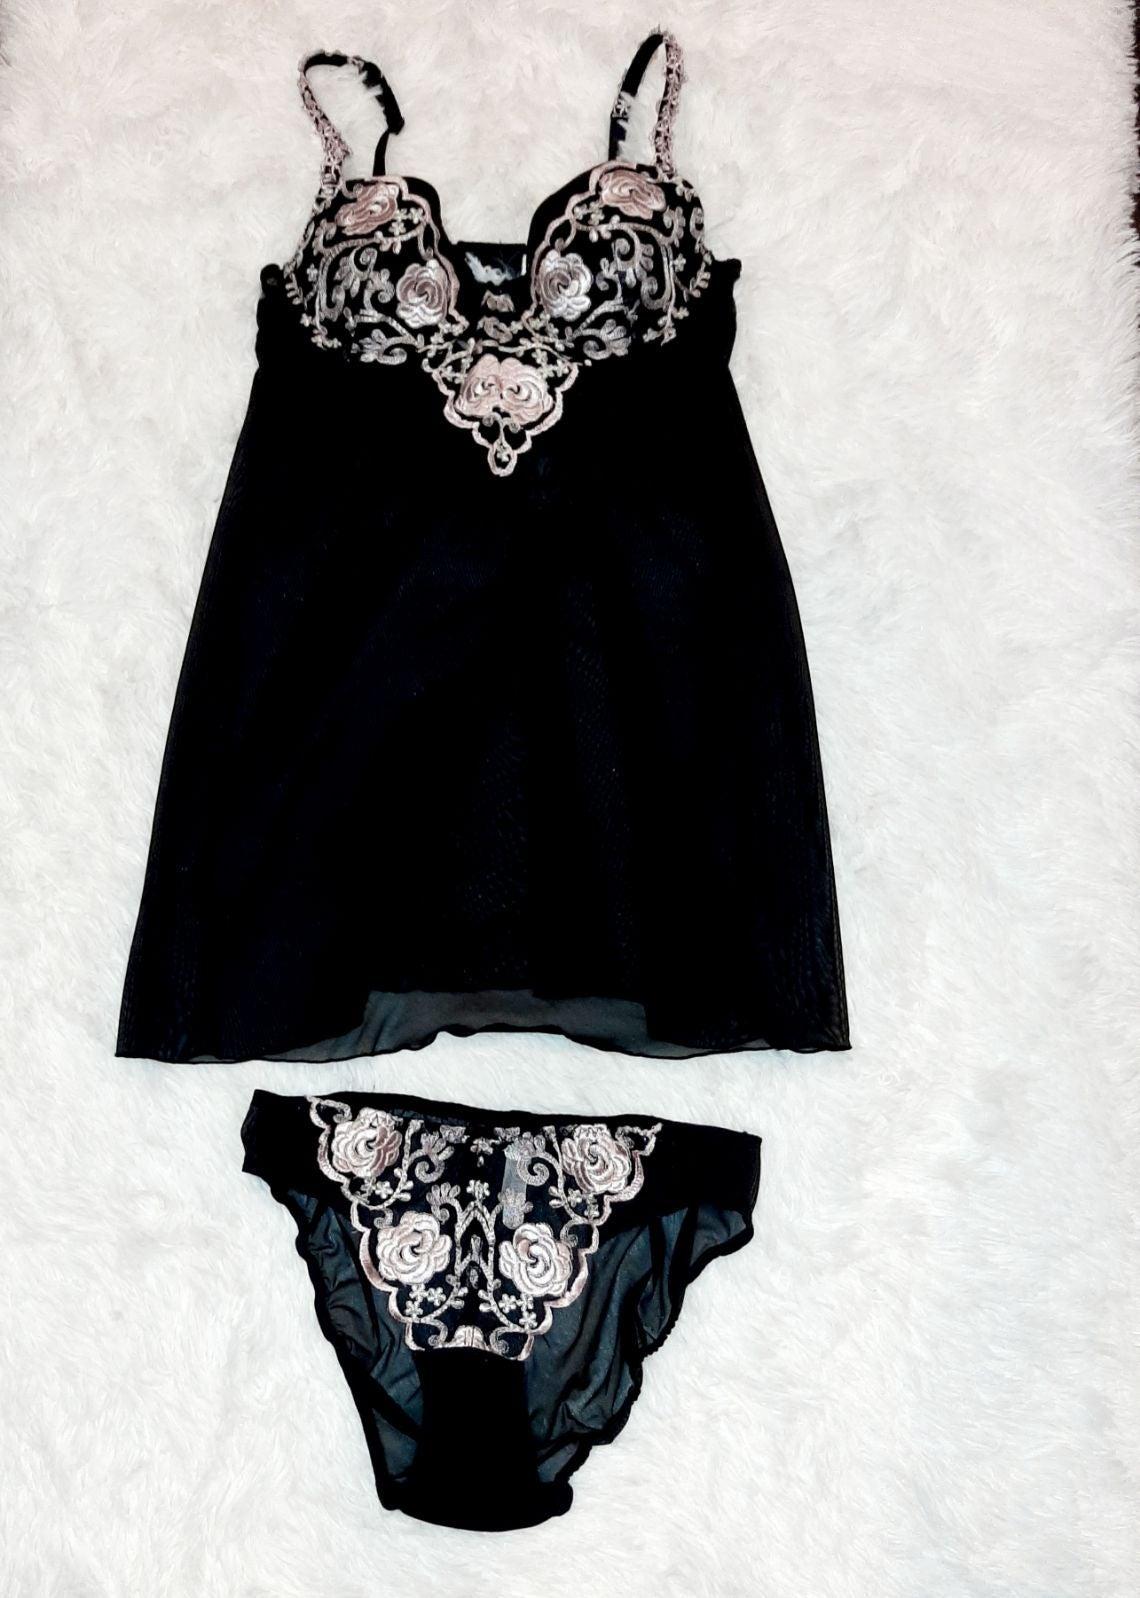 Black mesh floral lingerie top & panty